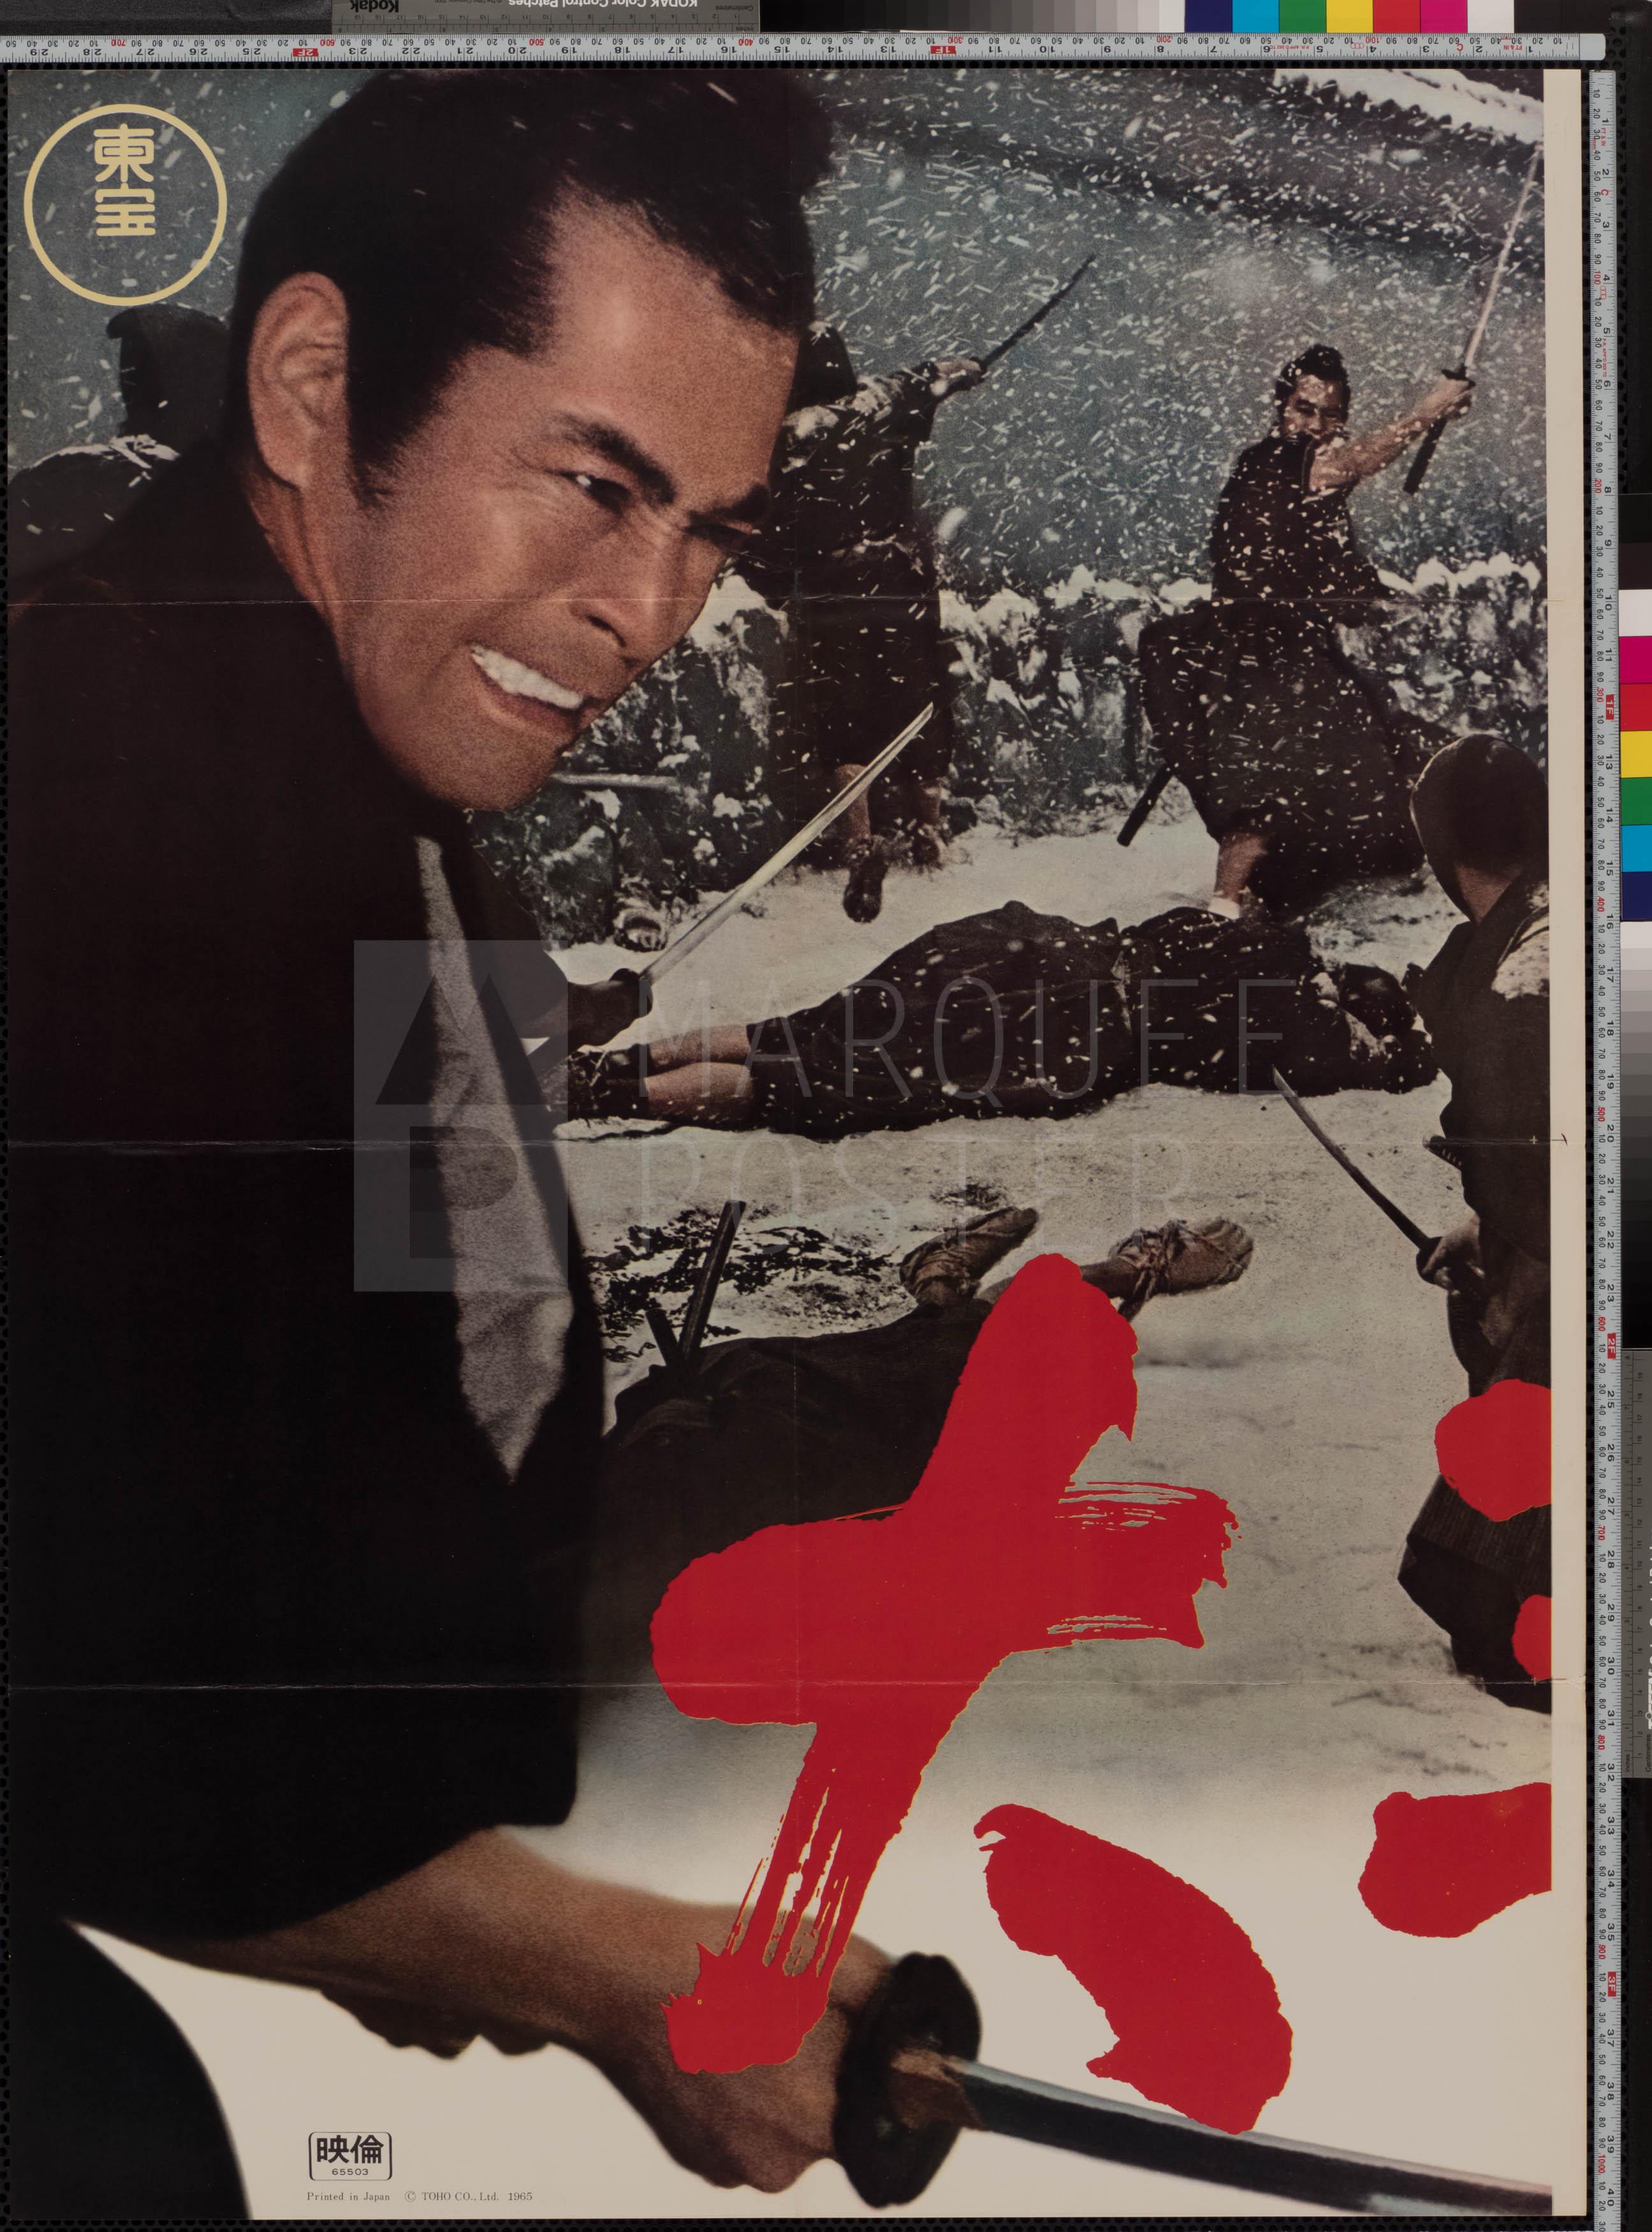 3-sword-of-doom-japanese-b1x3-1966-02